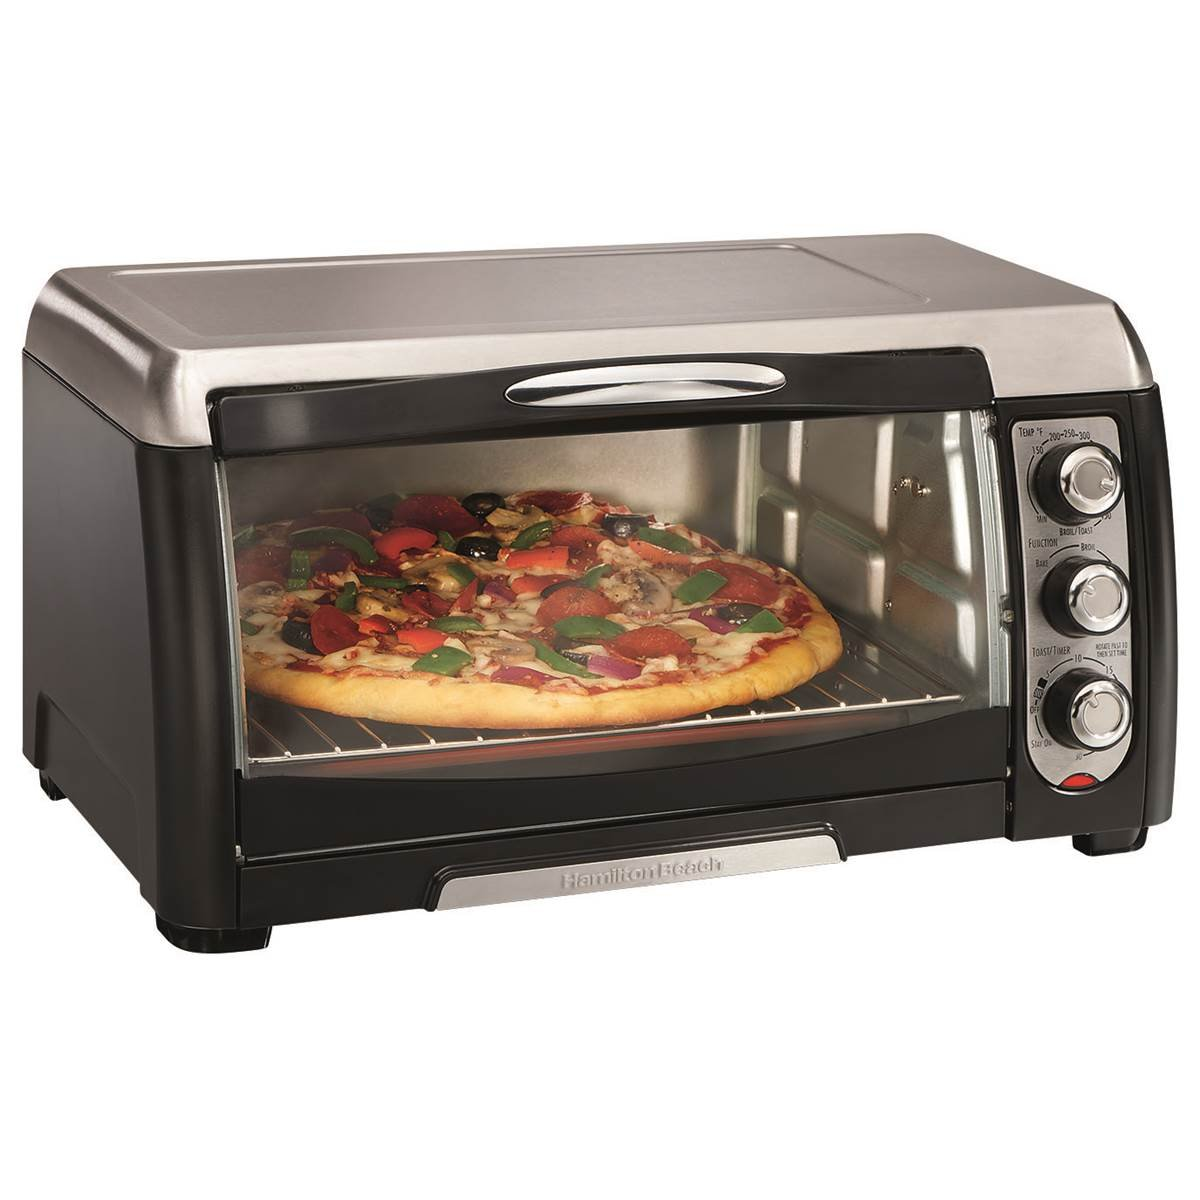 Hamilton Beach 6 Slice Capacity Toaster Oven Broiler